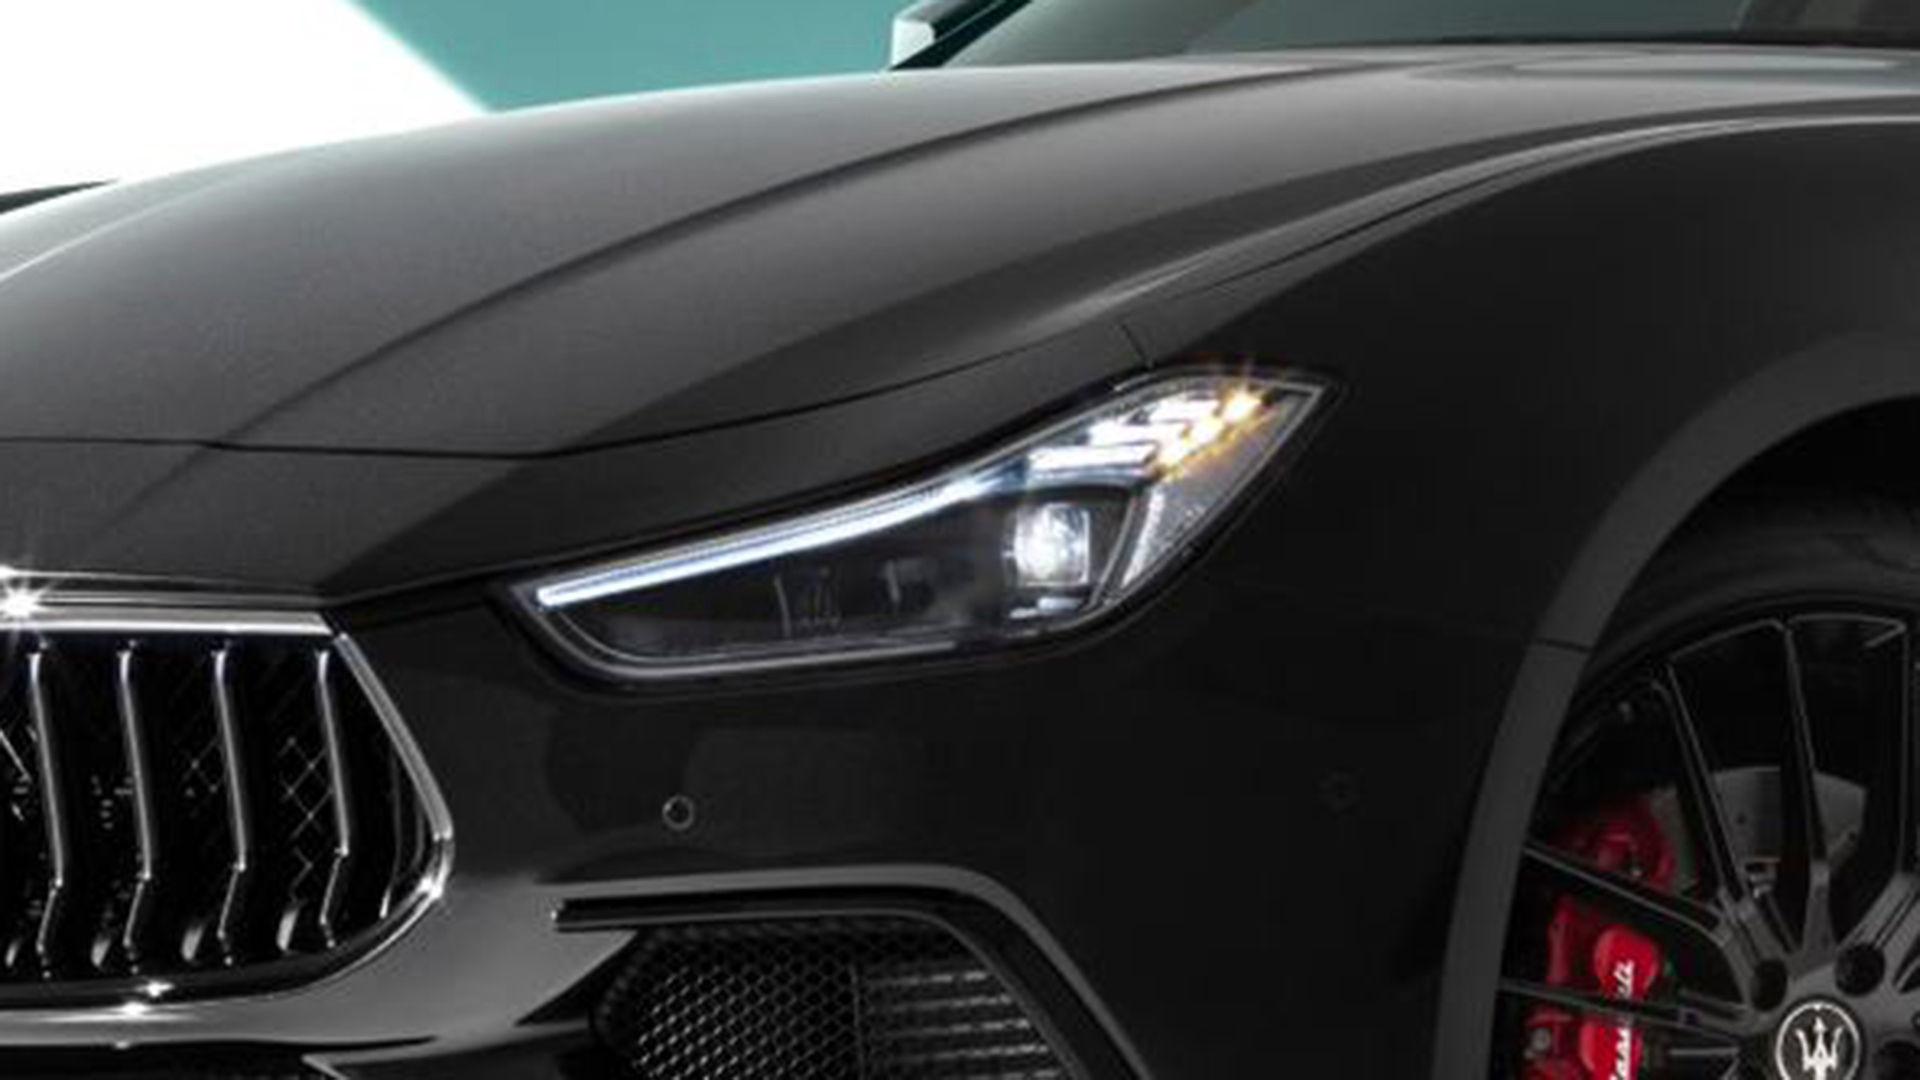 Maserati Ghibli - Adaptive Voll-LED Matrix Scheinwerfer